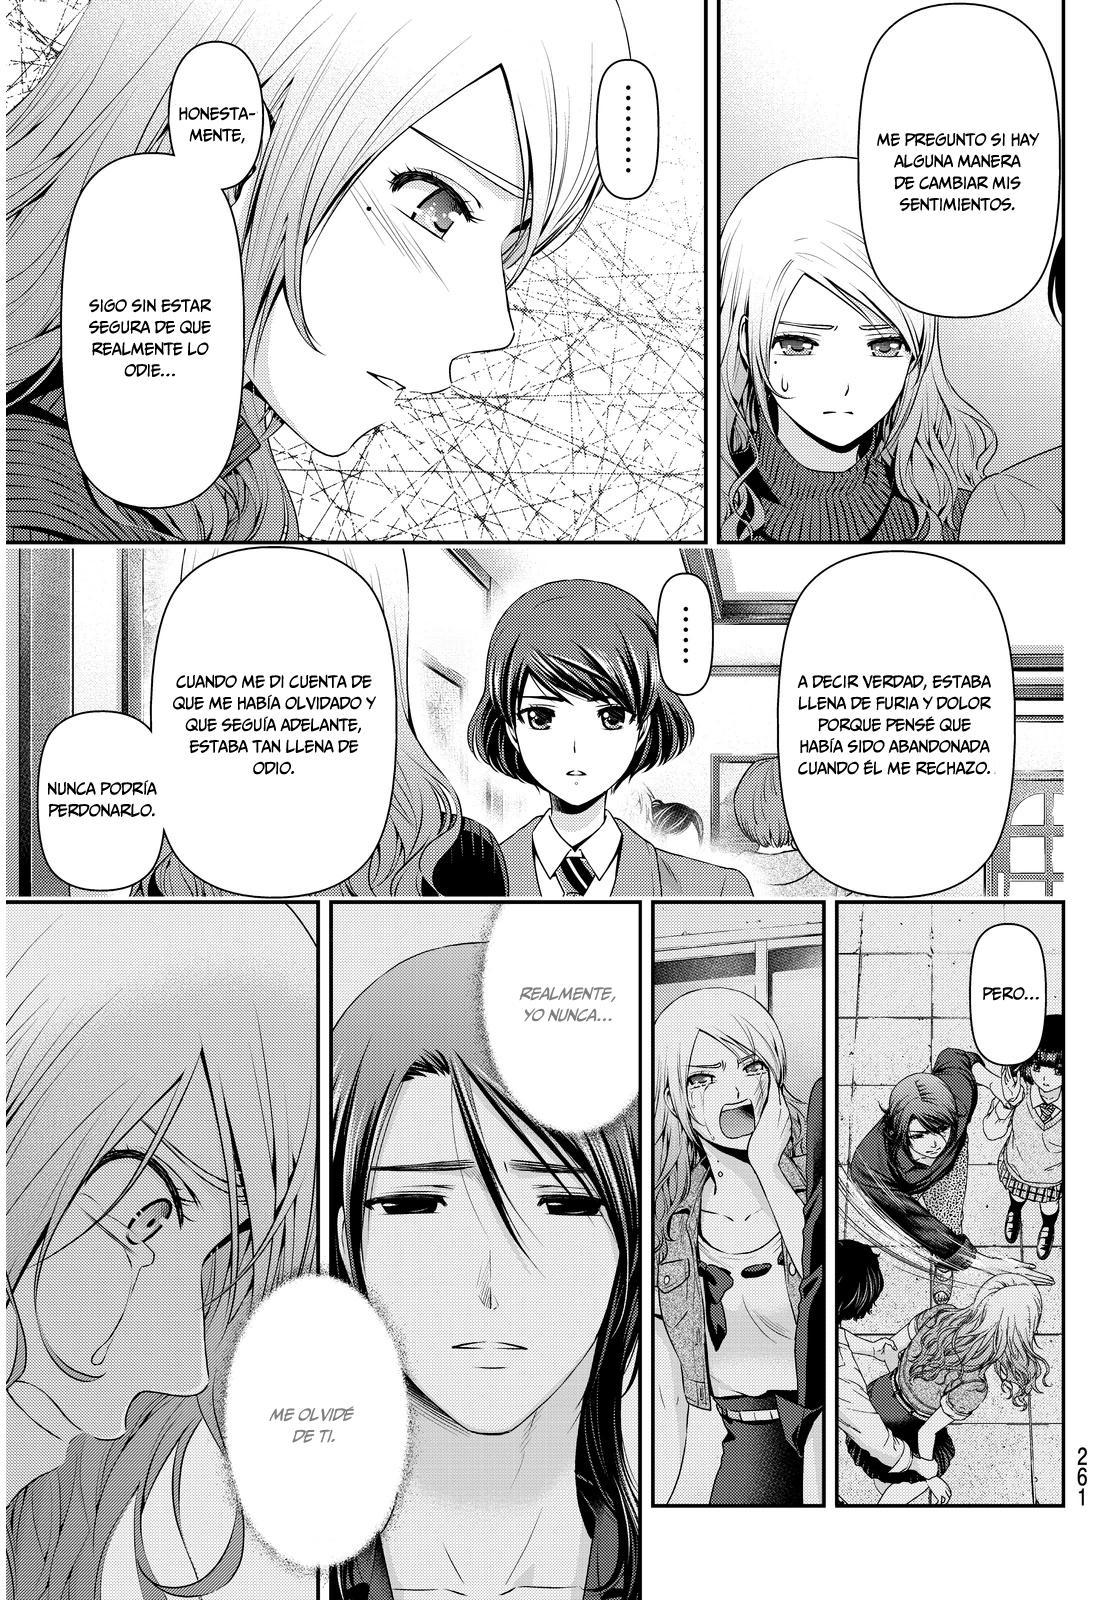 https://c5.ninemanga.com/es_manga/9/14345/418231/0ce98f53e3aa229aa2f31b16e5dcbb4b.jpg Page 10